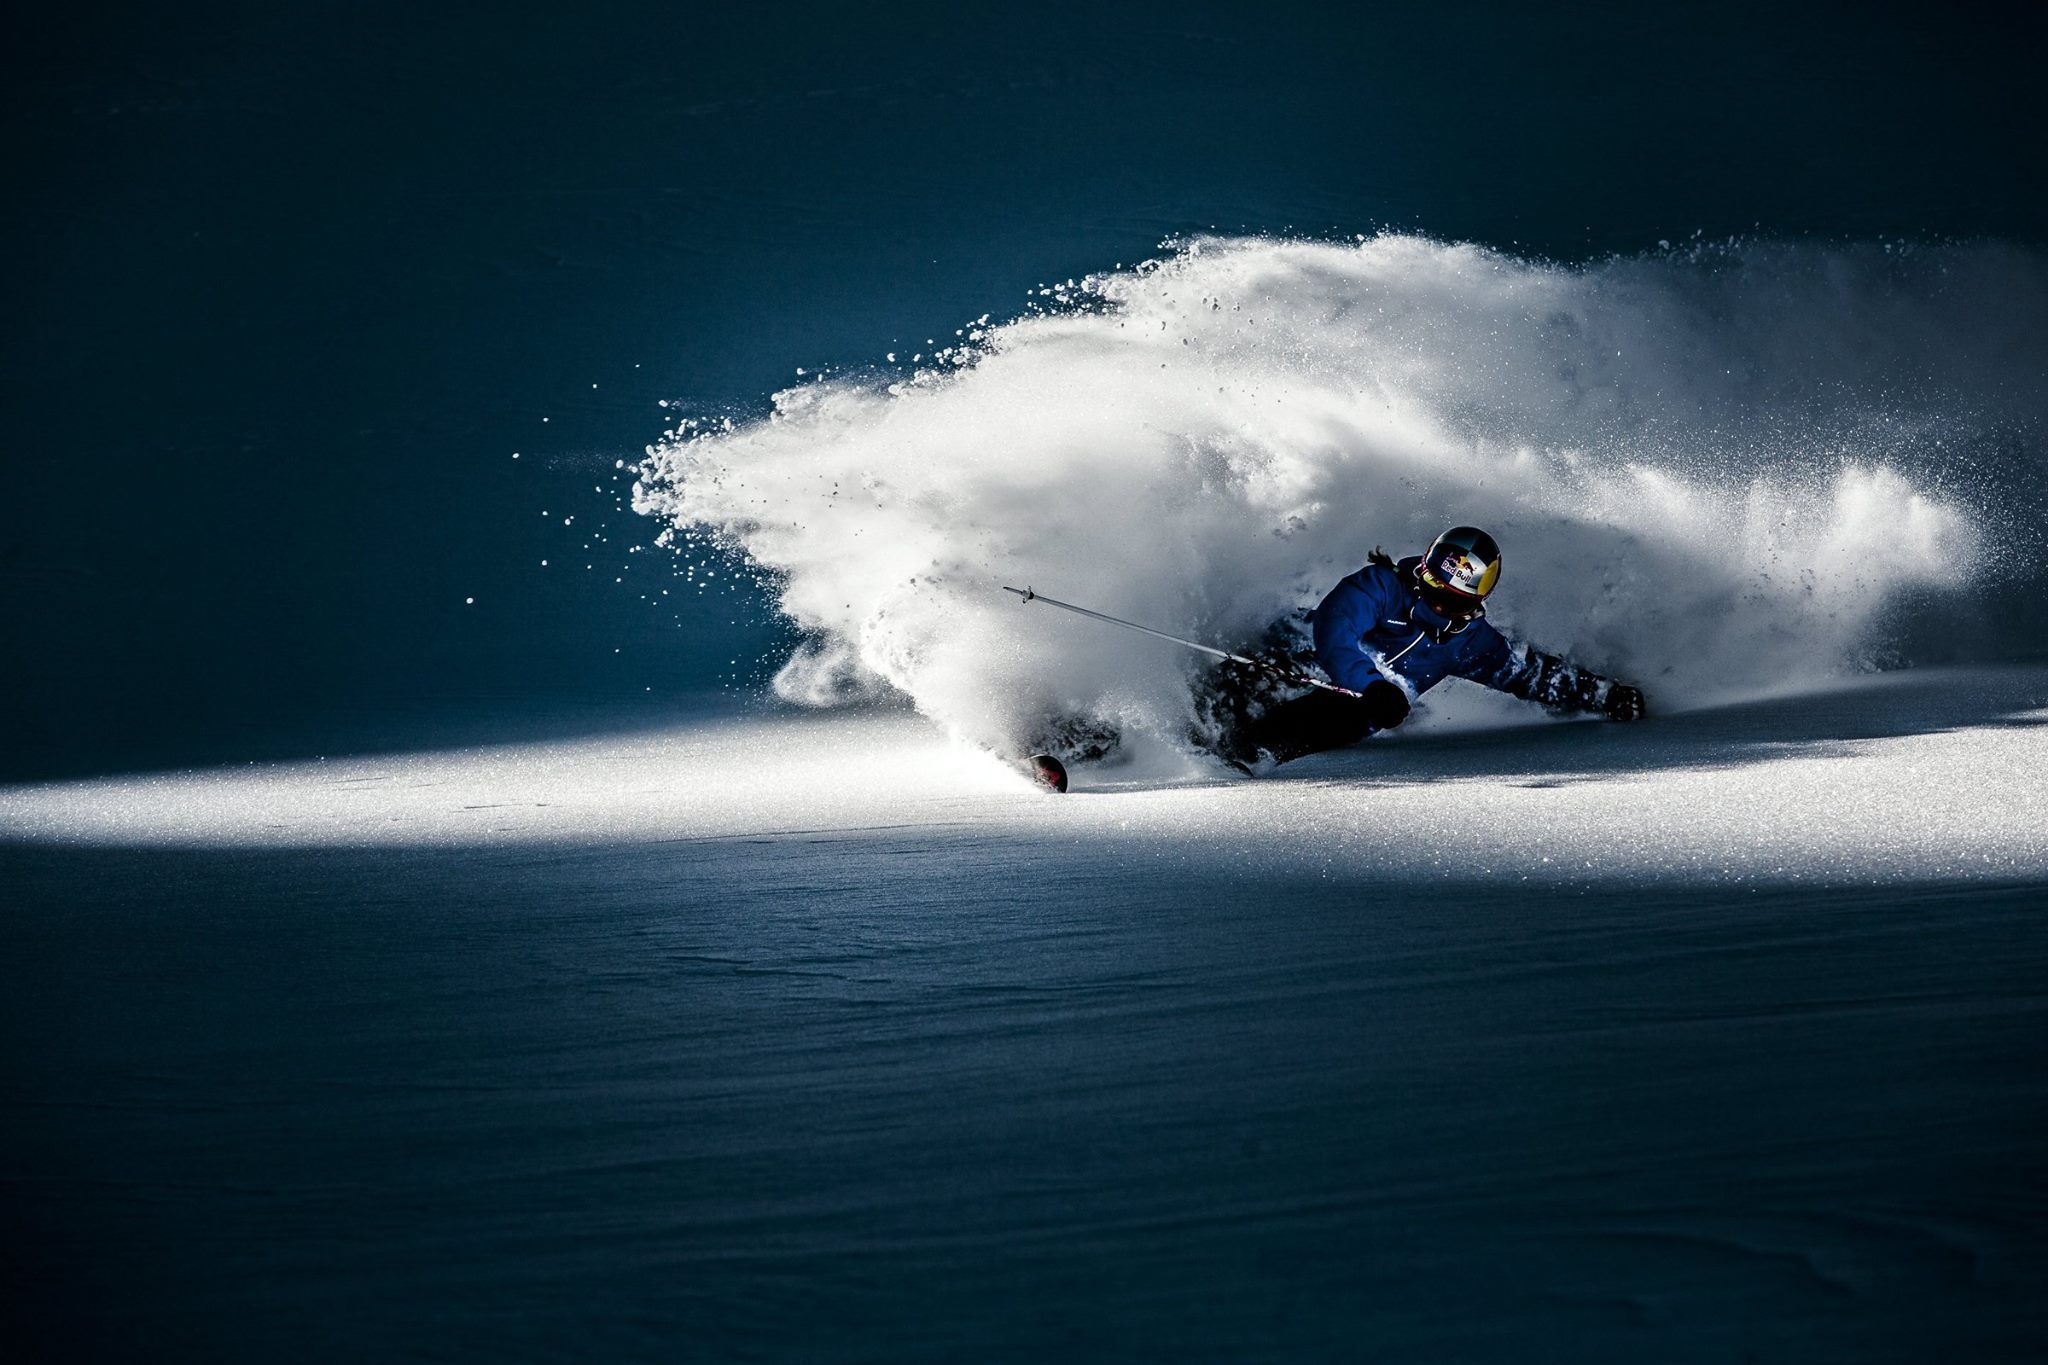 Photo- Christoph Schoech/Red Bull Content Pool Rider- Nadine Wallner